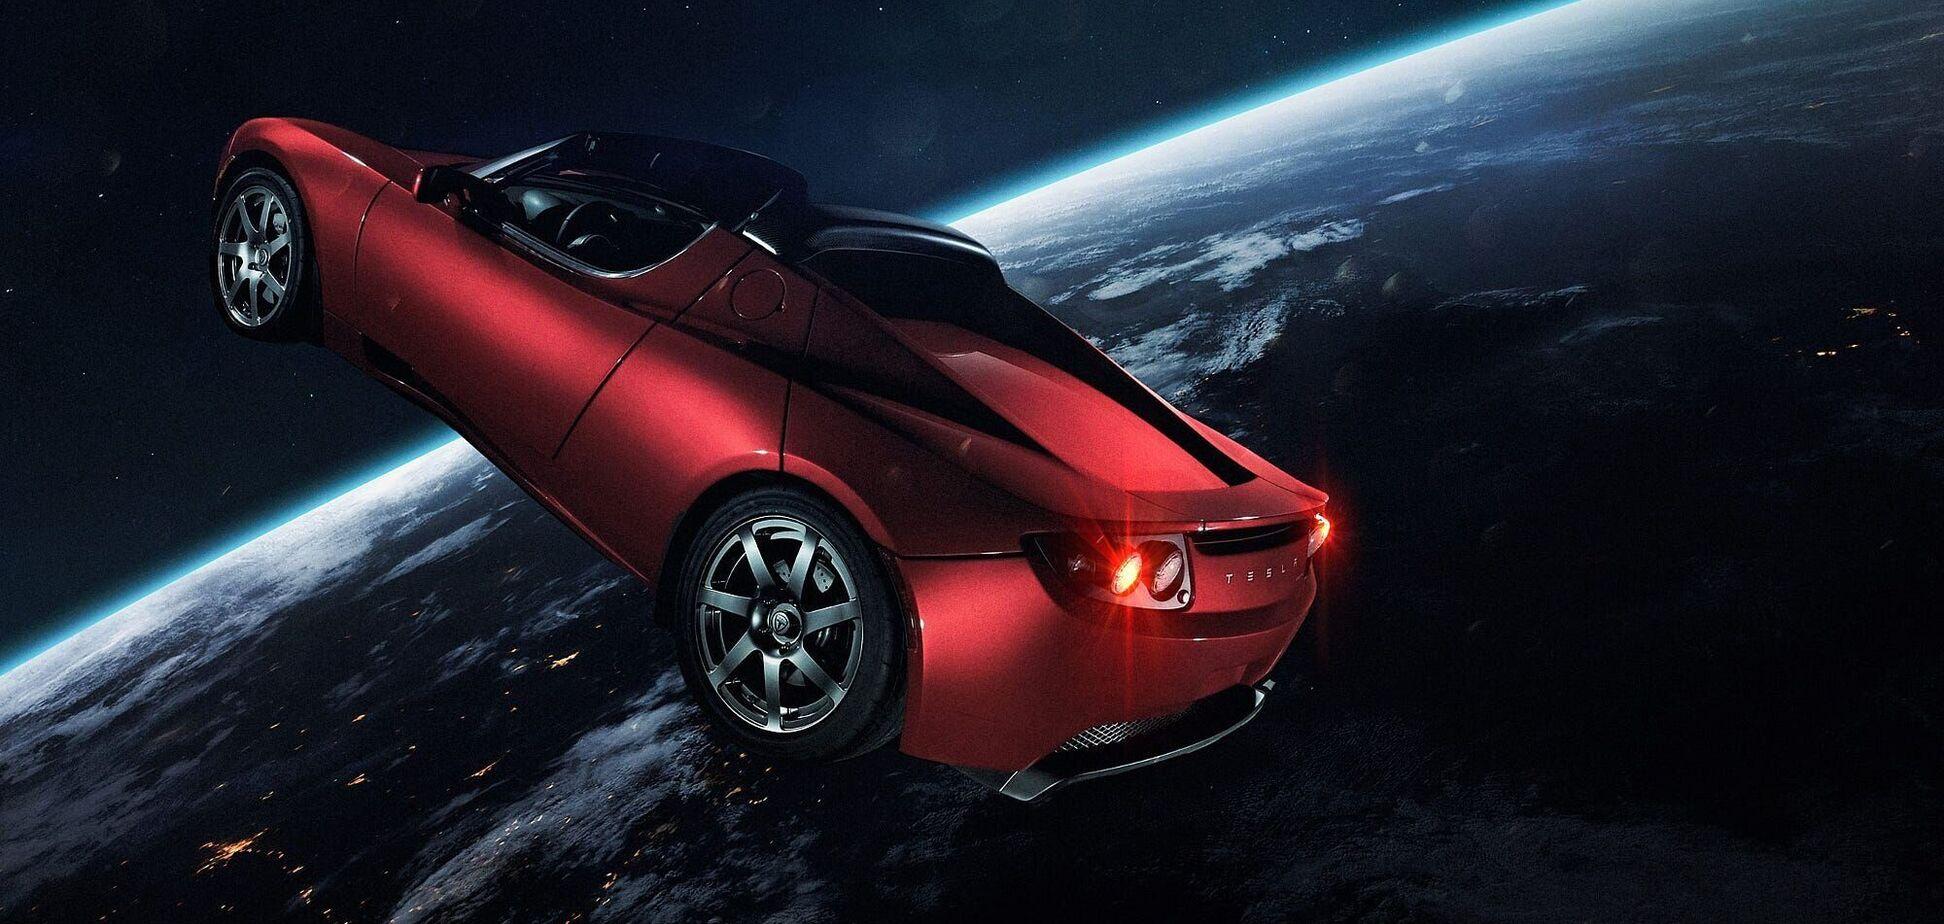 Tesla Roadster сильно отдалилась от Земли и уже признана космическим мусором. Фото: drom.ru